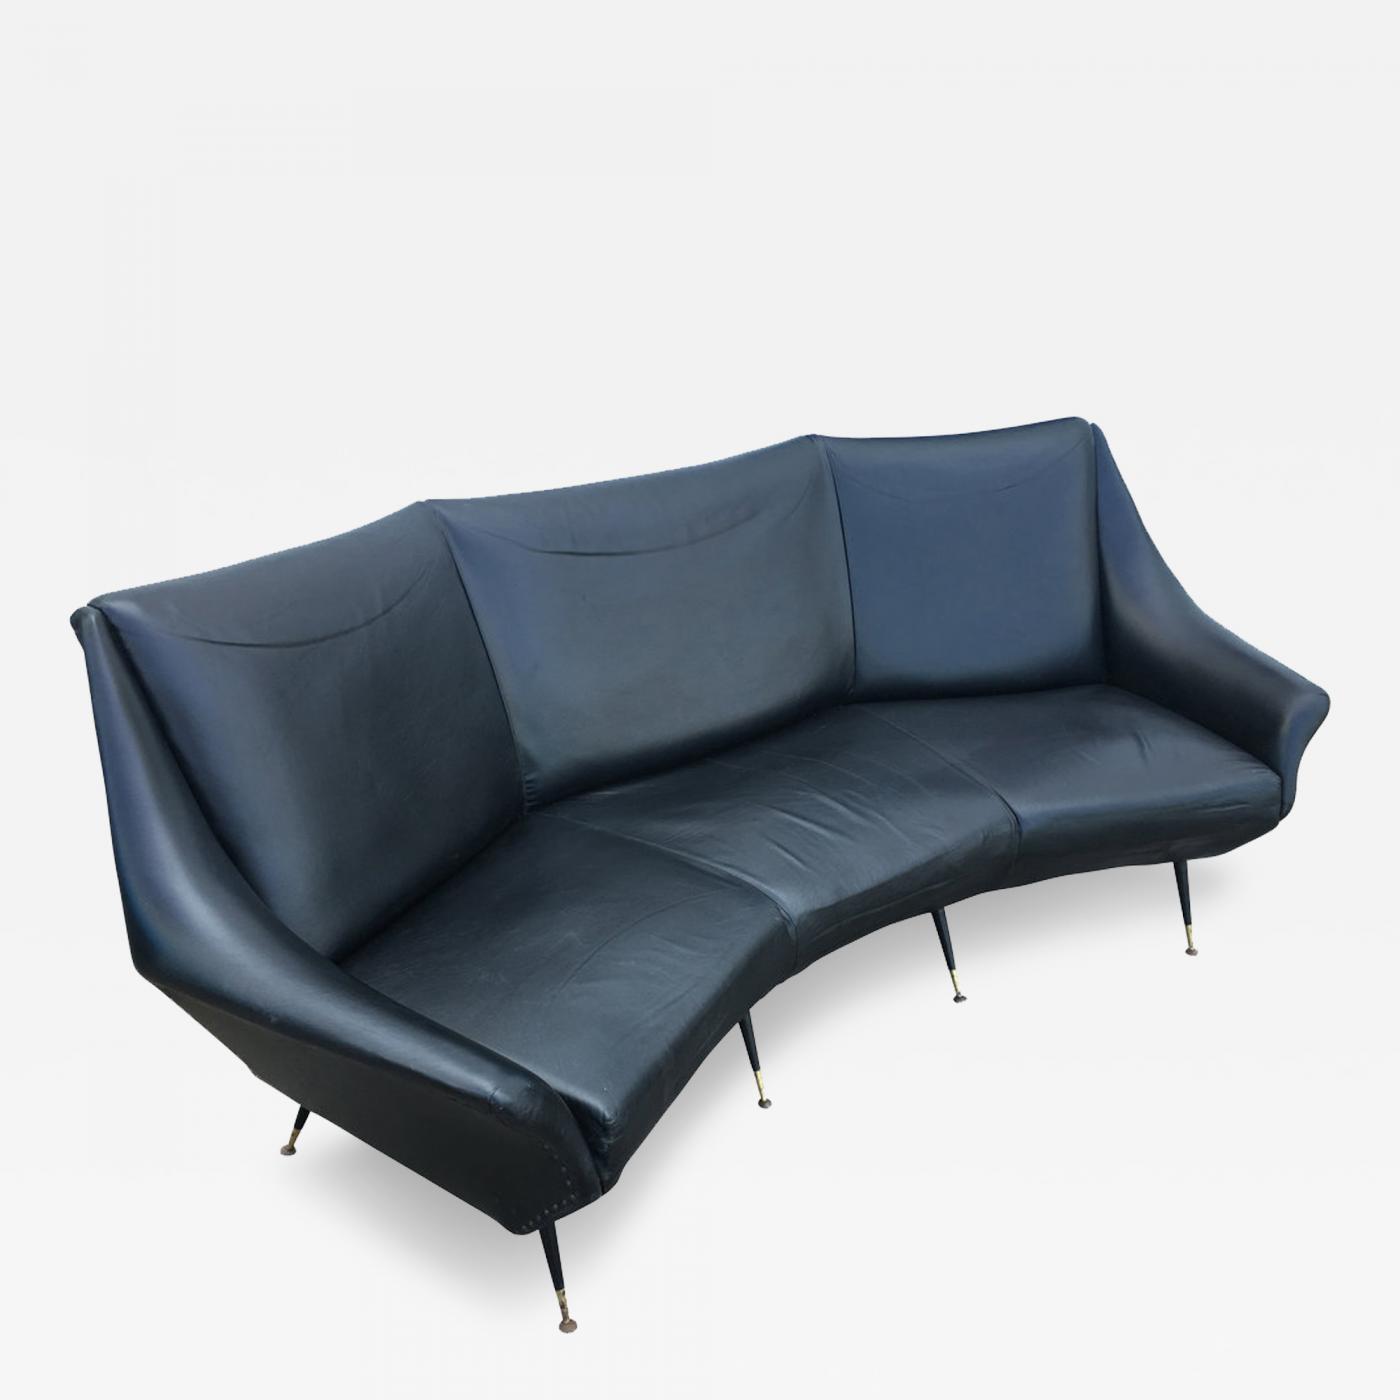 Curved Mid-Century Italian Sofa